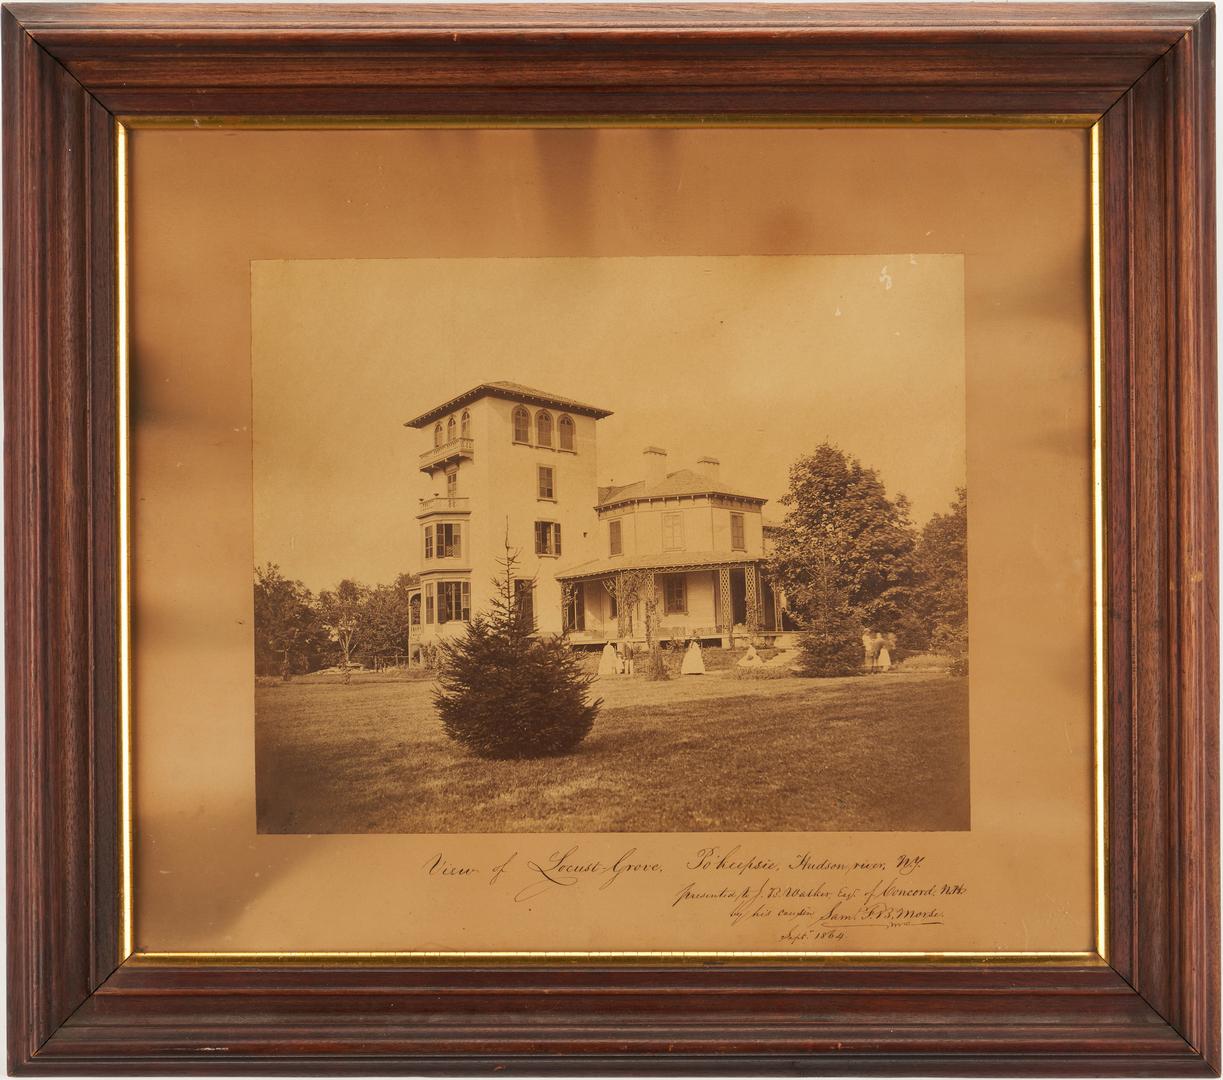 Lot 649: Signed Samuel Morse Photograph of Locust Grove